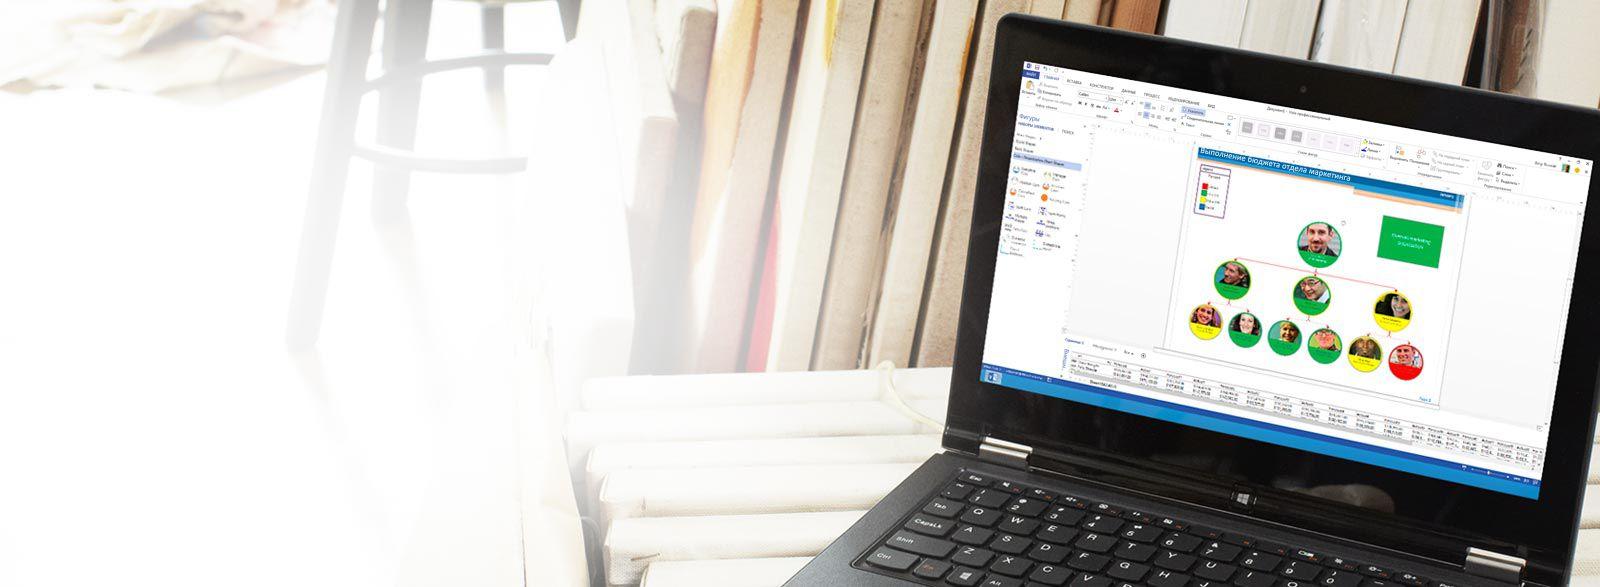 Активация Office 365 Office 2016 или Office 2013  Служба